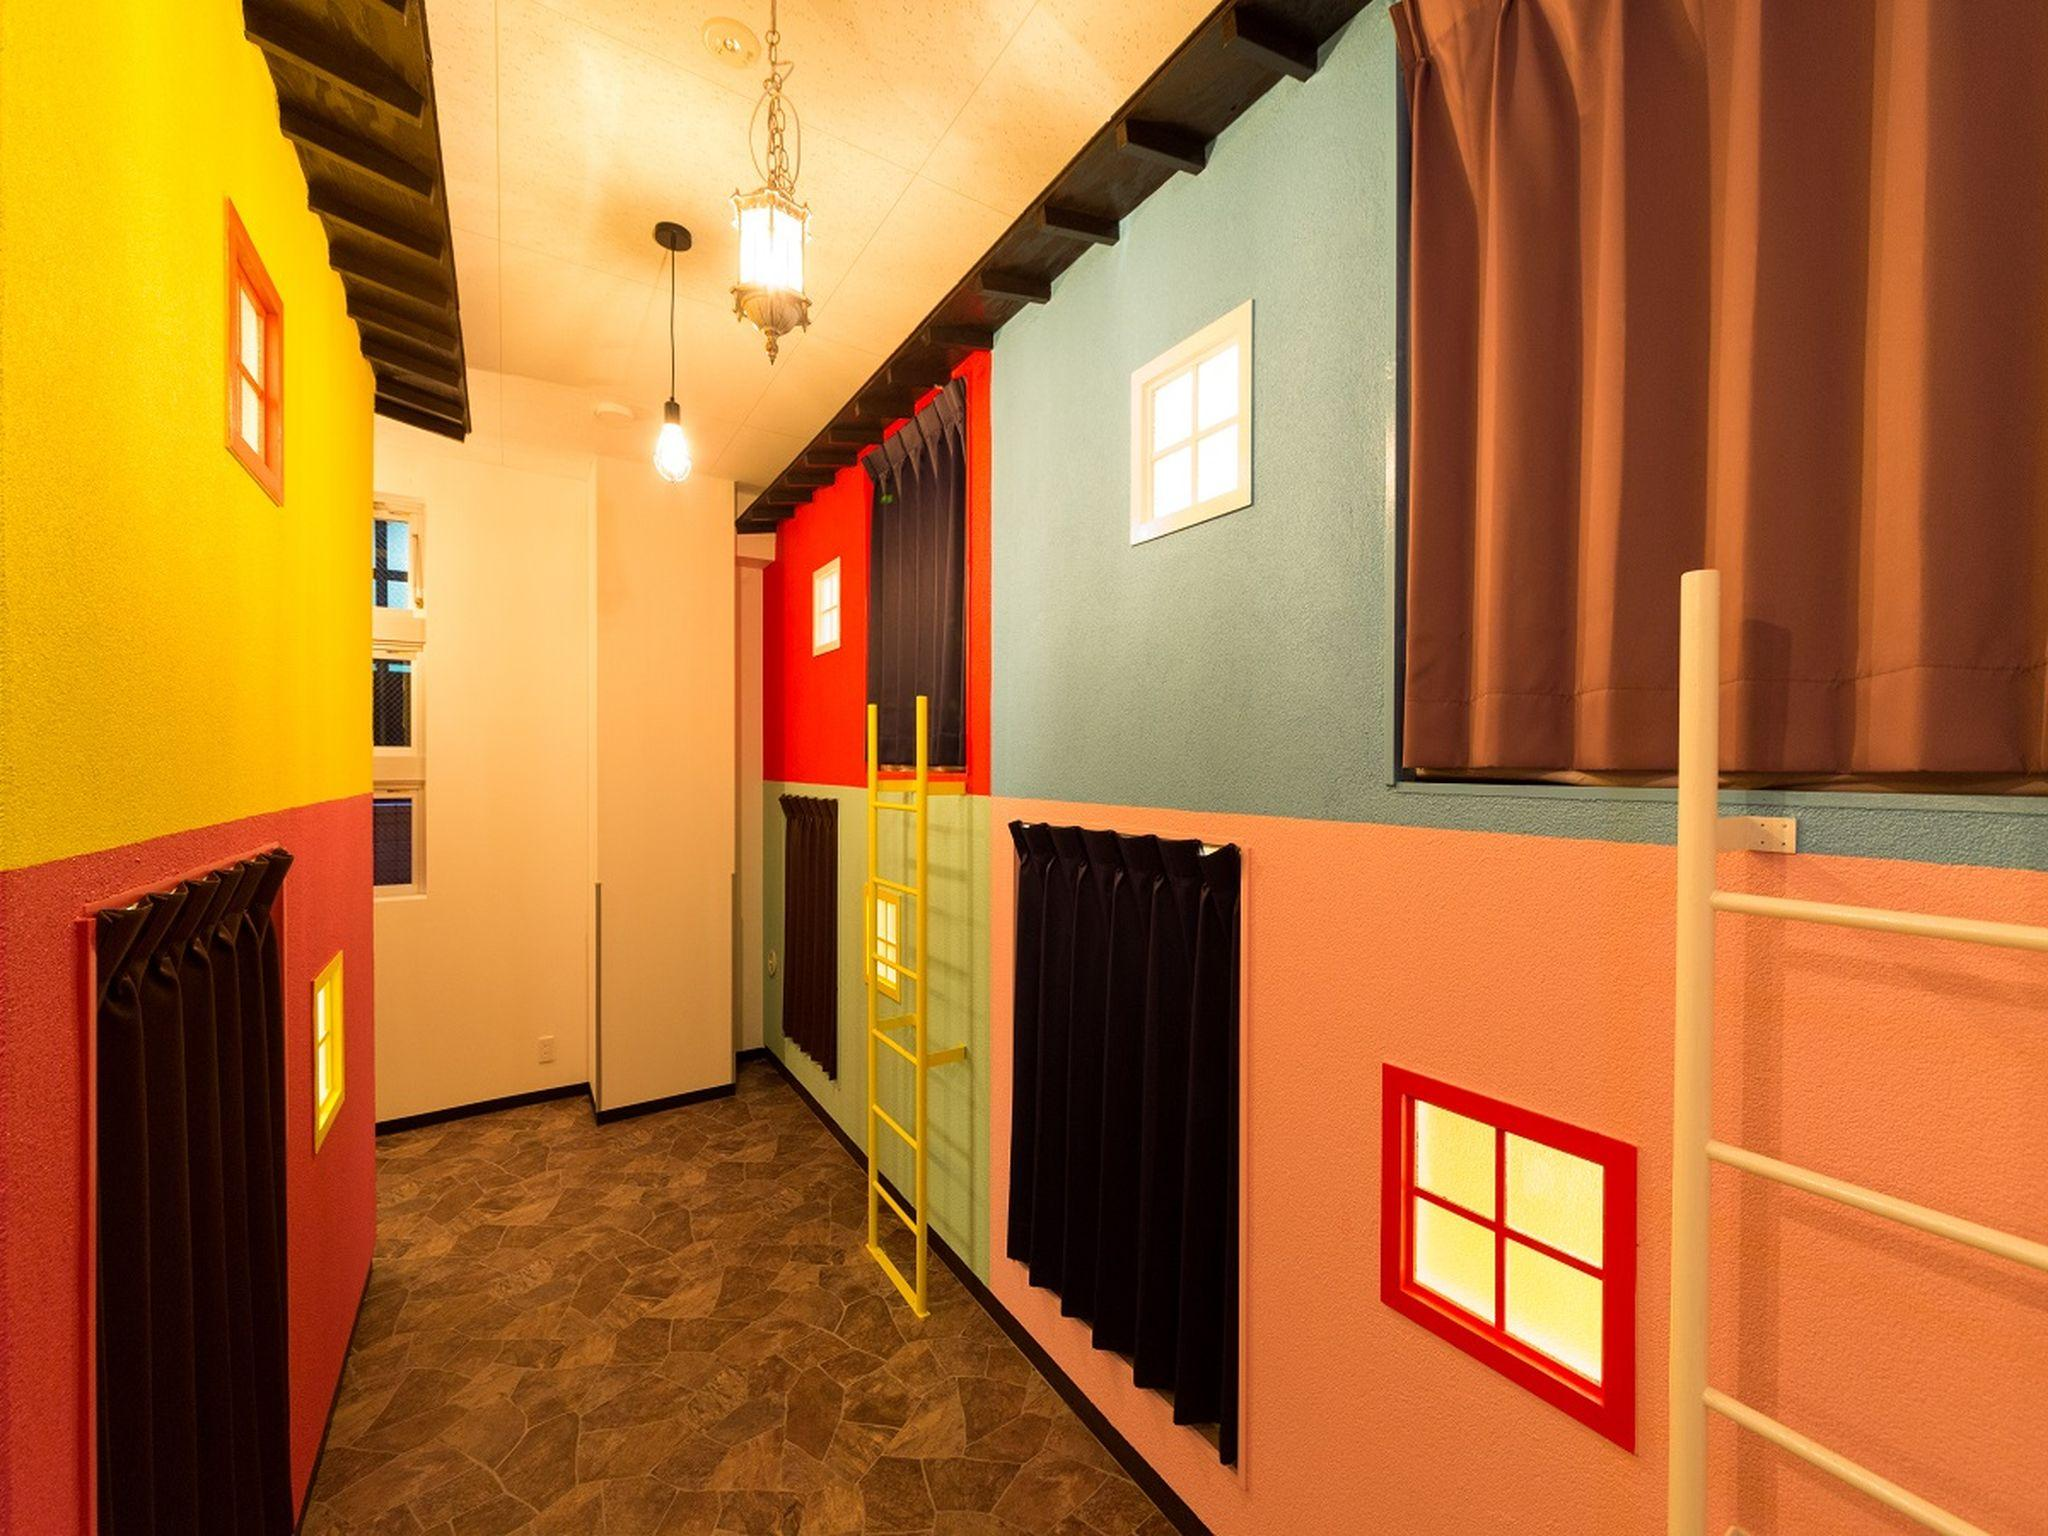 zen interior design on a bud interior design services on a budget Guestroom